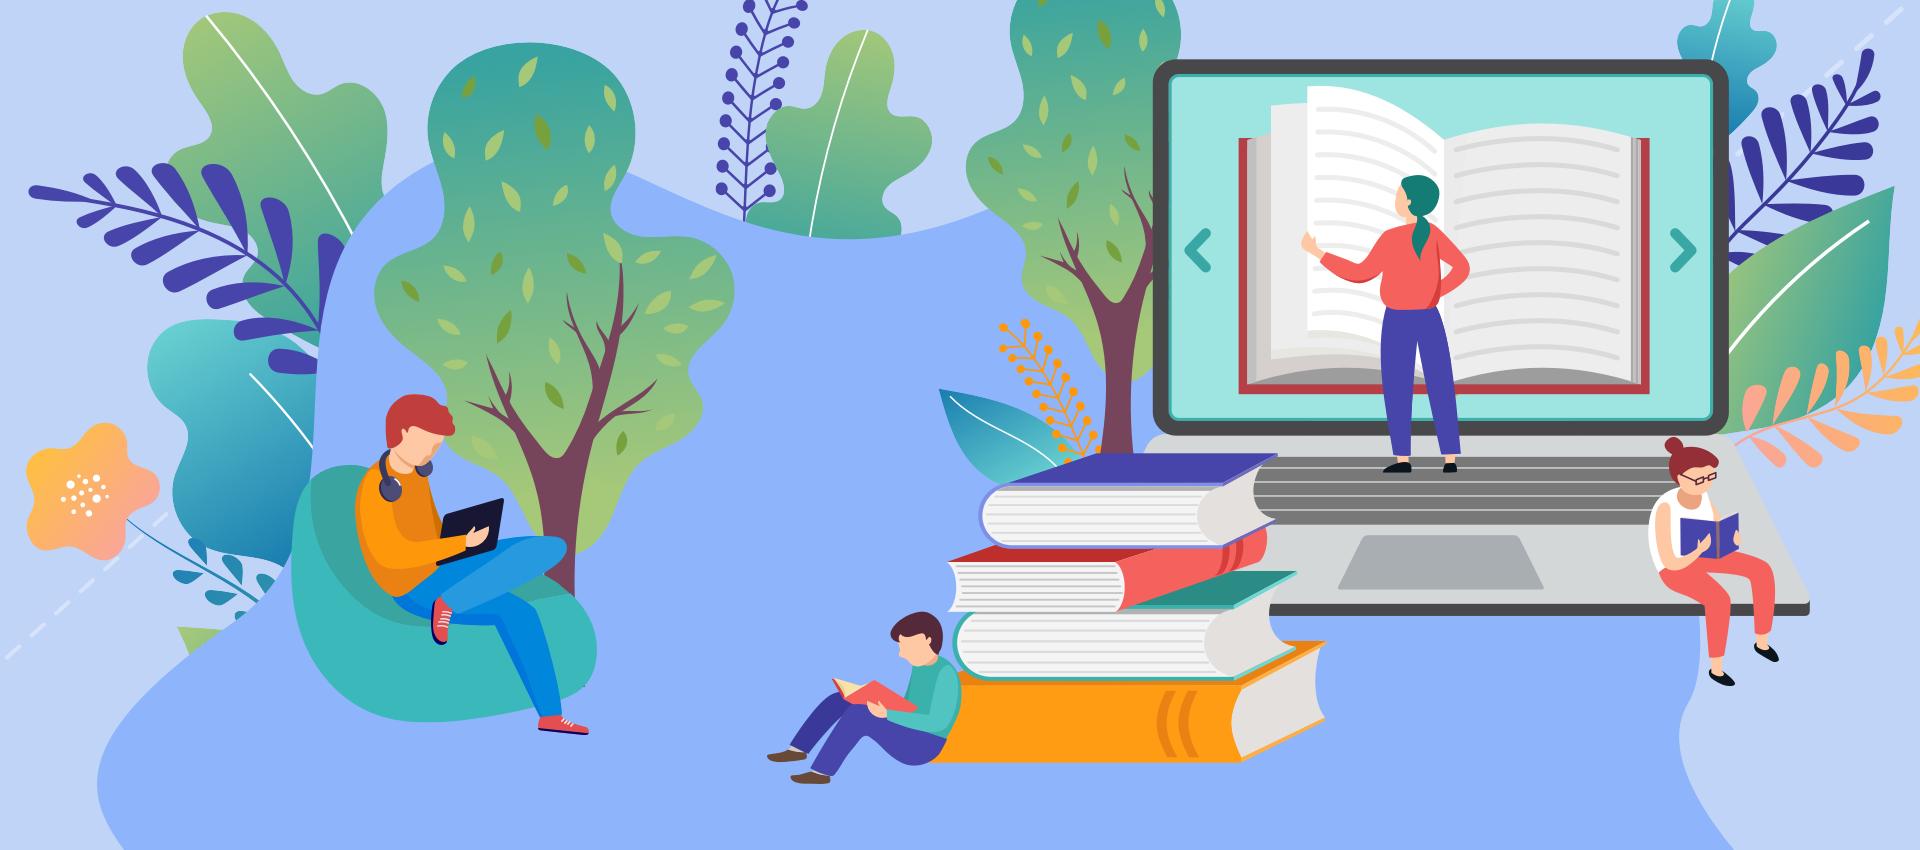 illustration showing virtual learning